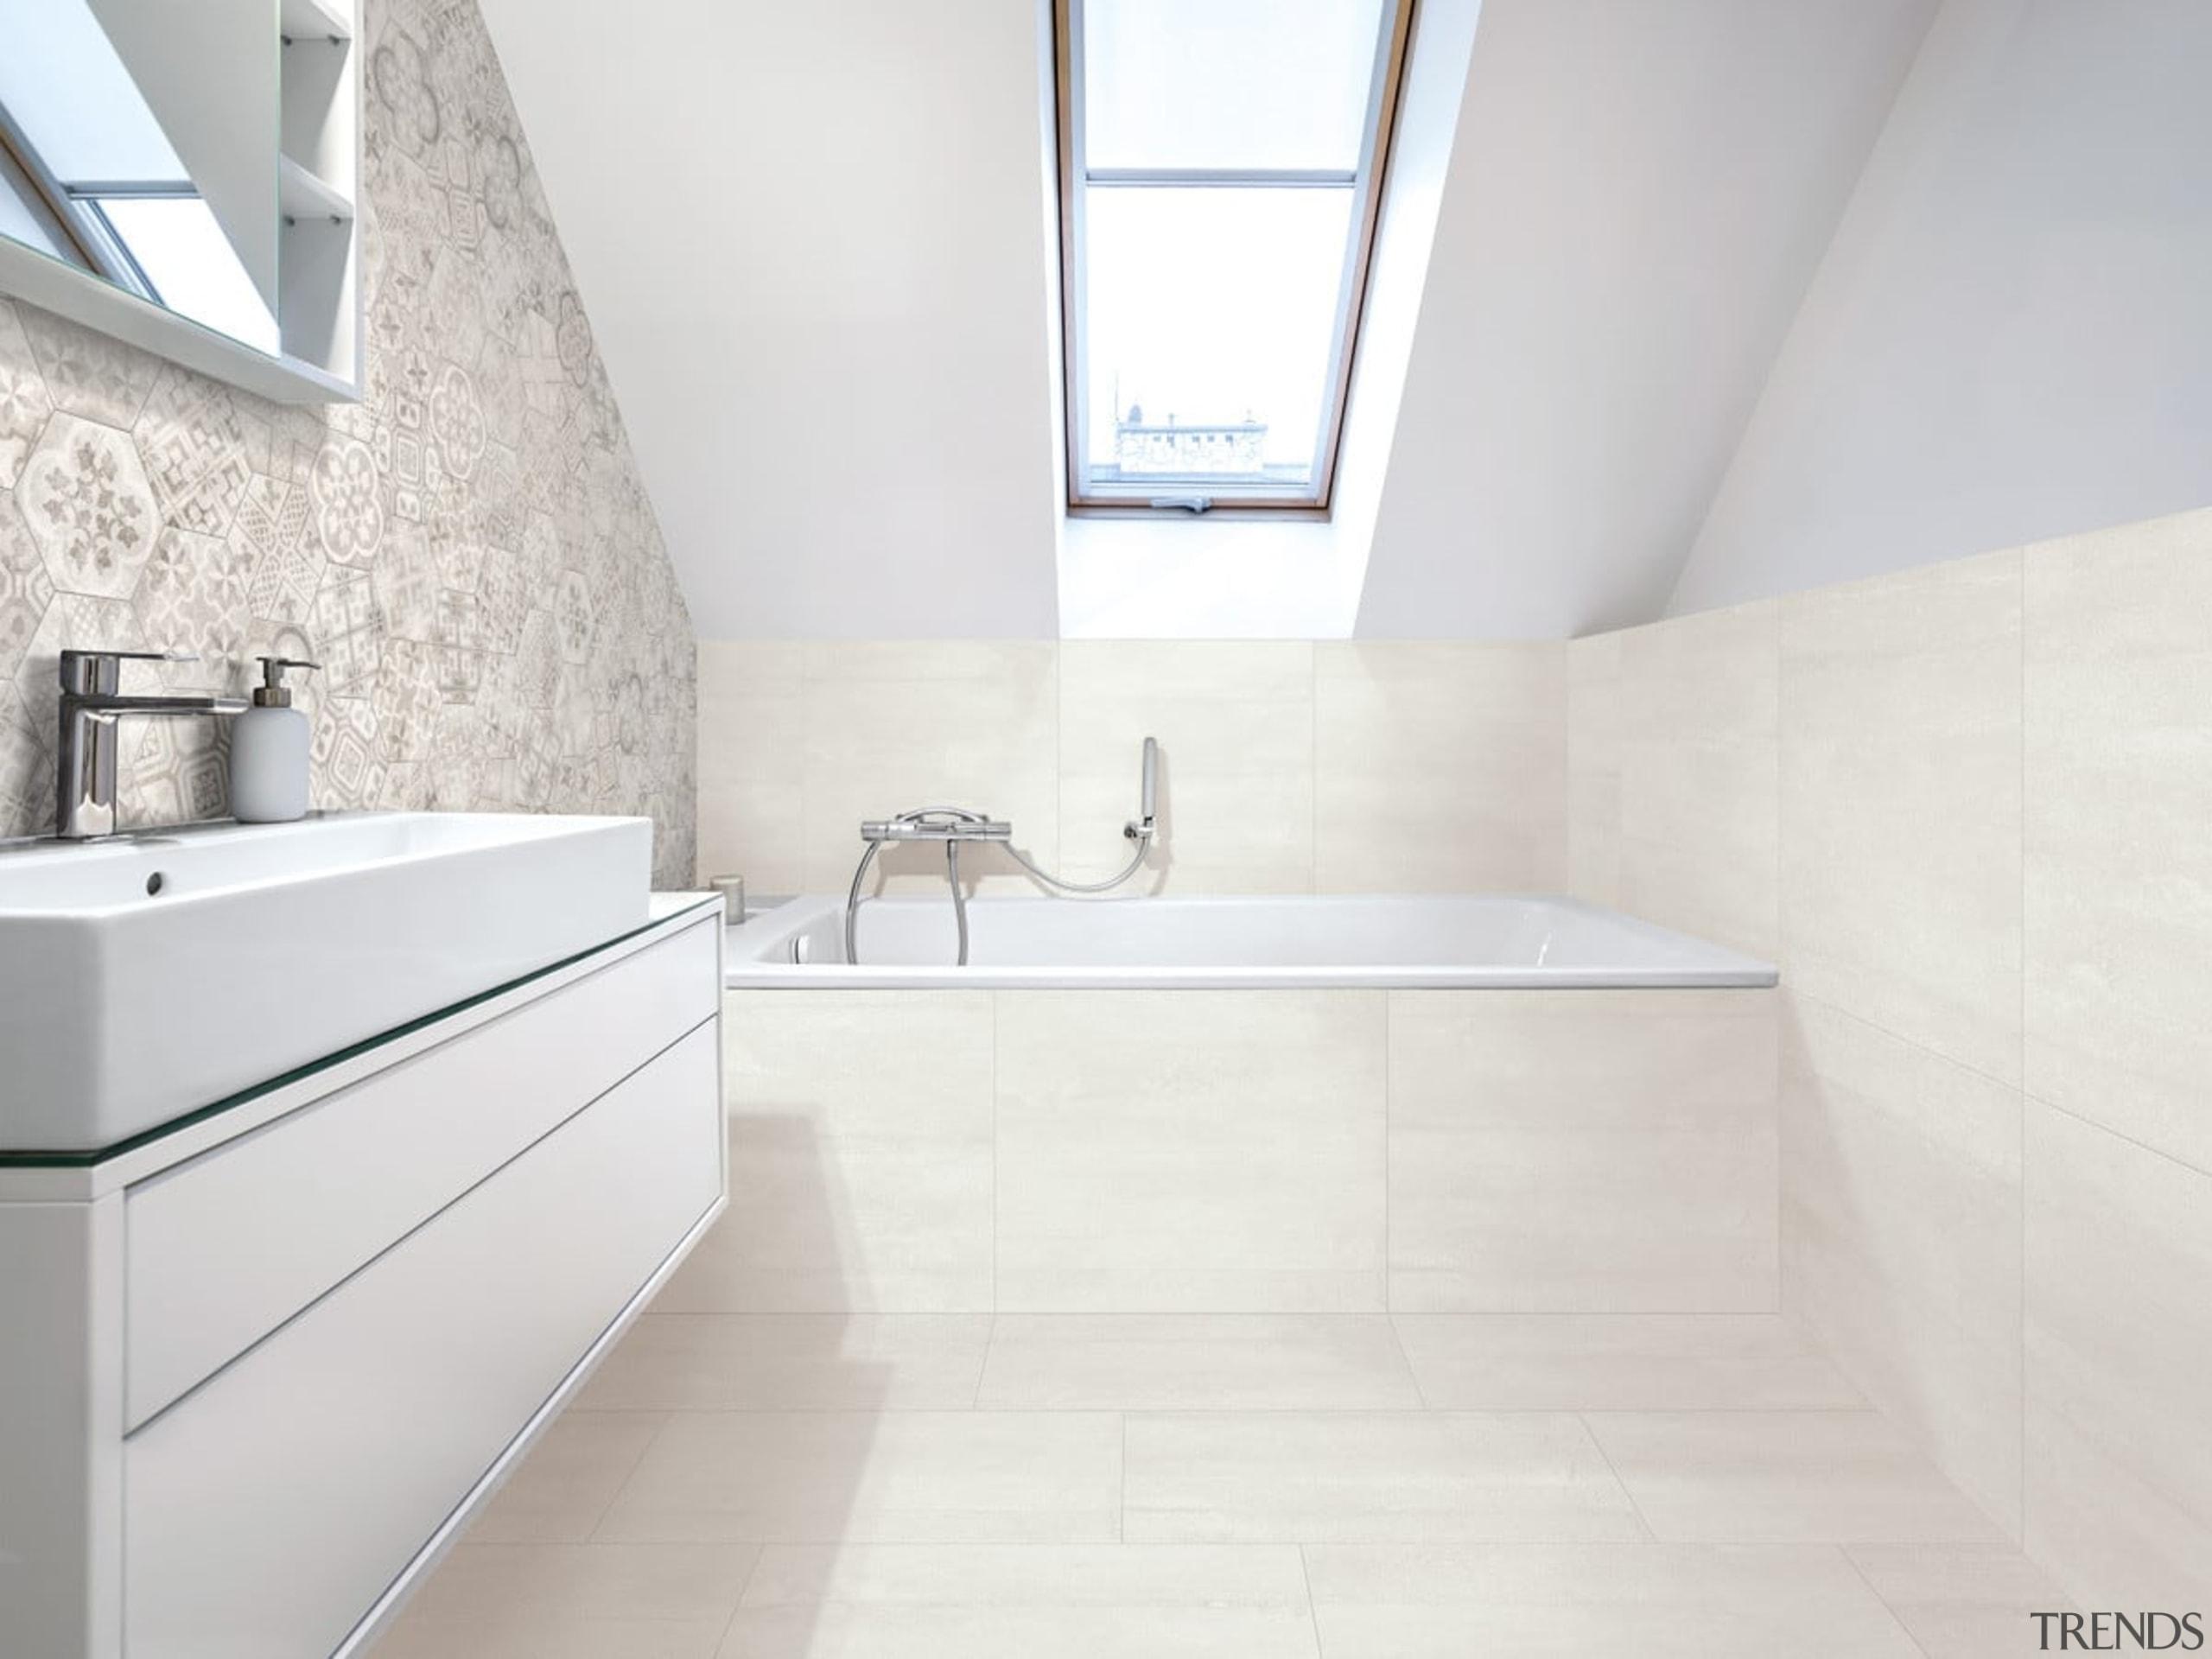 Beton Axis Hexagona Deco Mix 210x182, and Beton architecture, bathroom, daylighting, floor, flooring, interior design, property, room, sink, tap, tile, wall, white